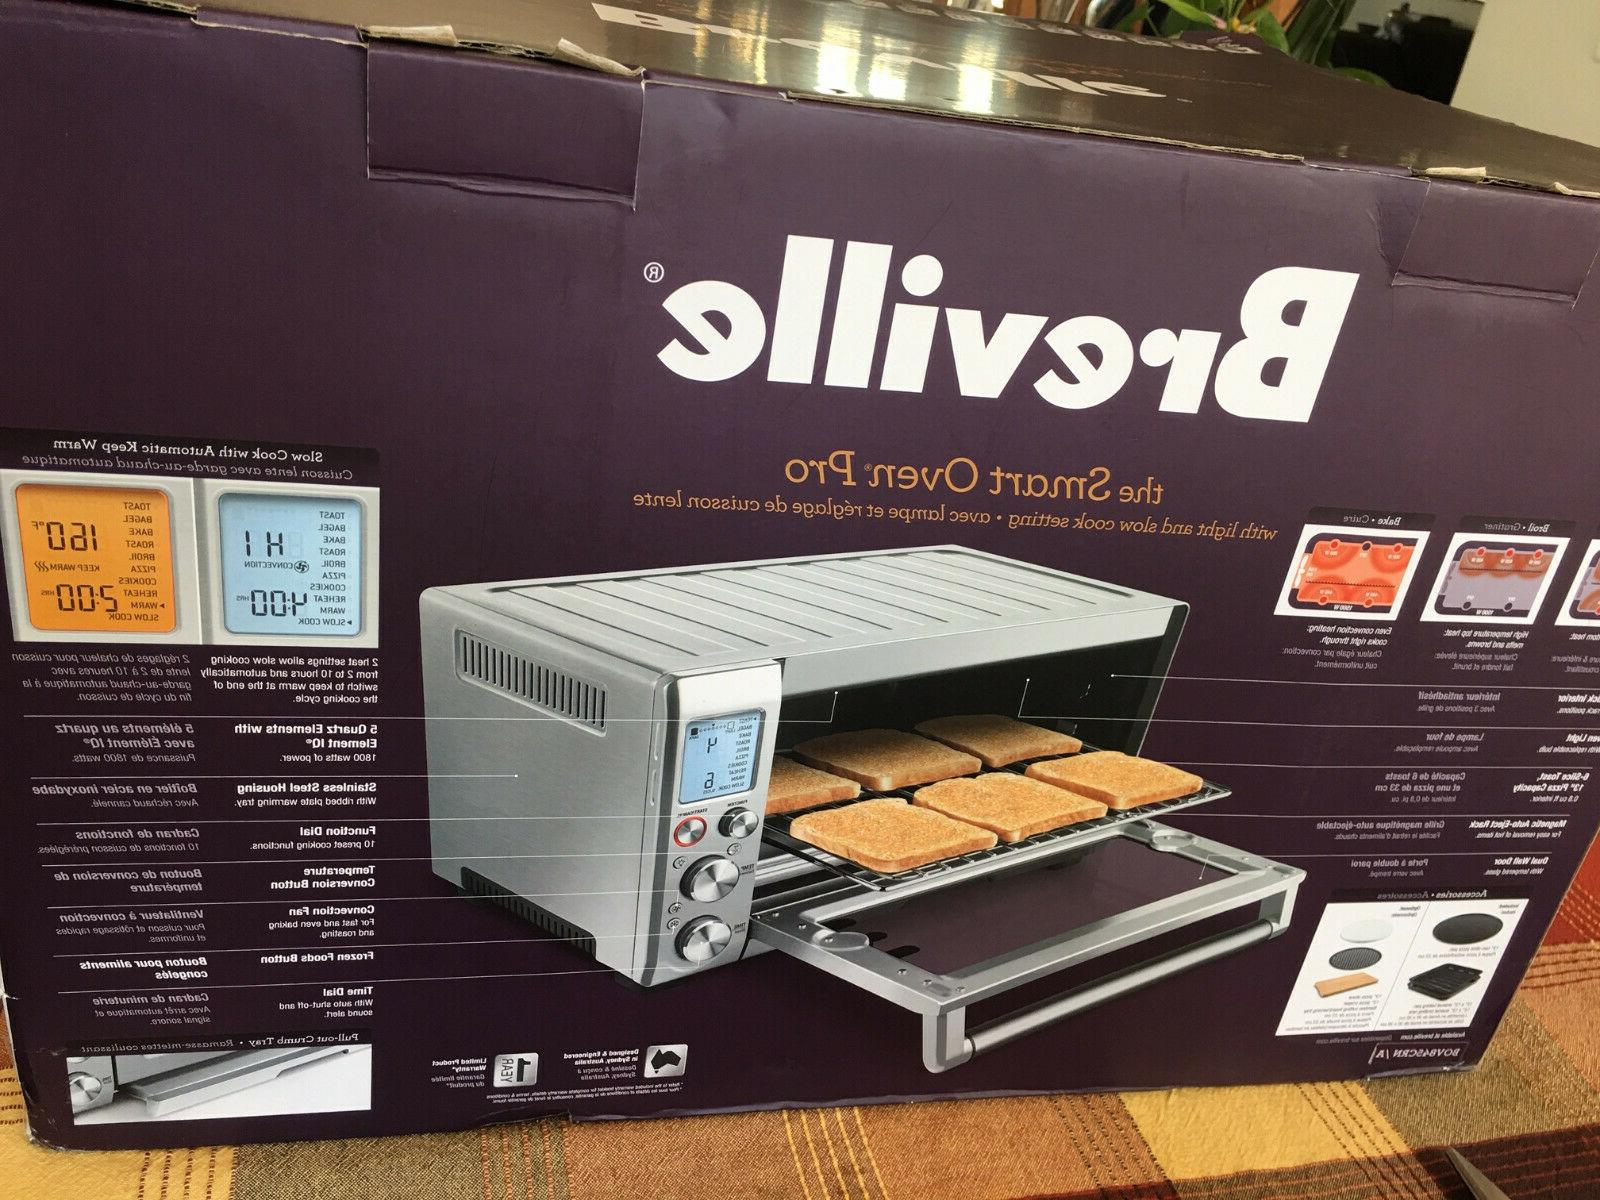 NEW Smart Pro Countertop Convection Oven, BOV845CRN,